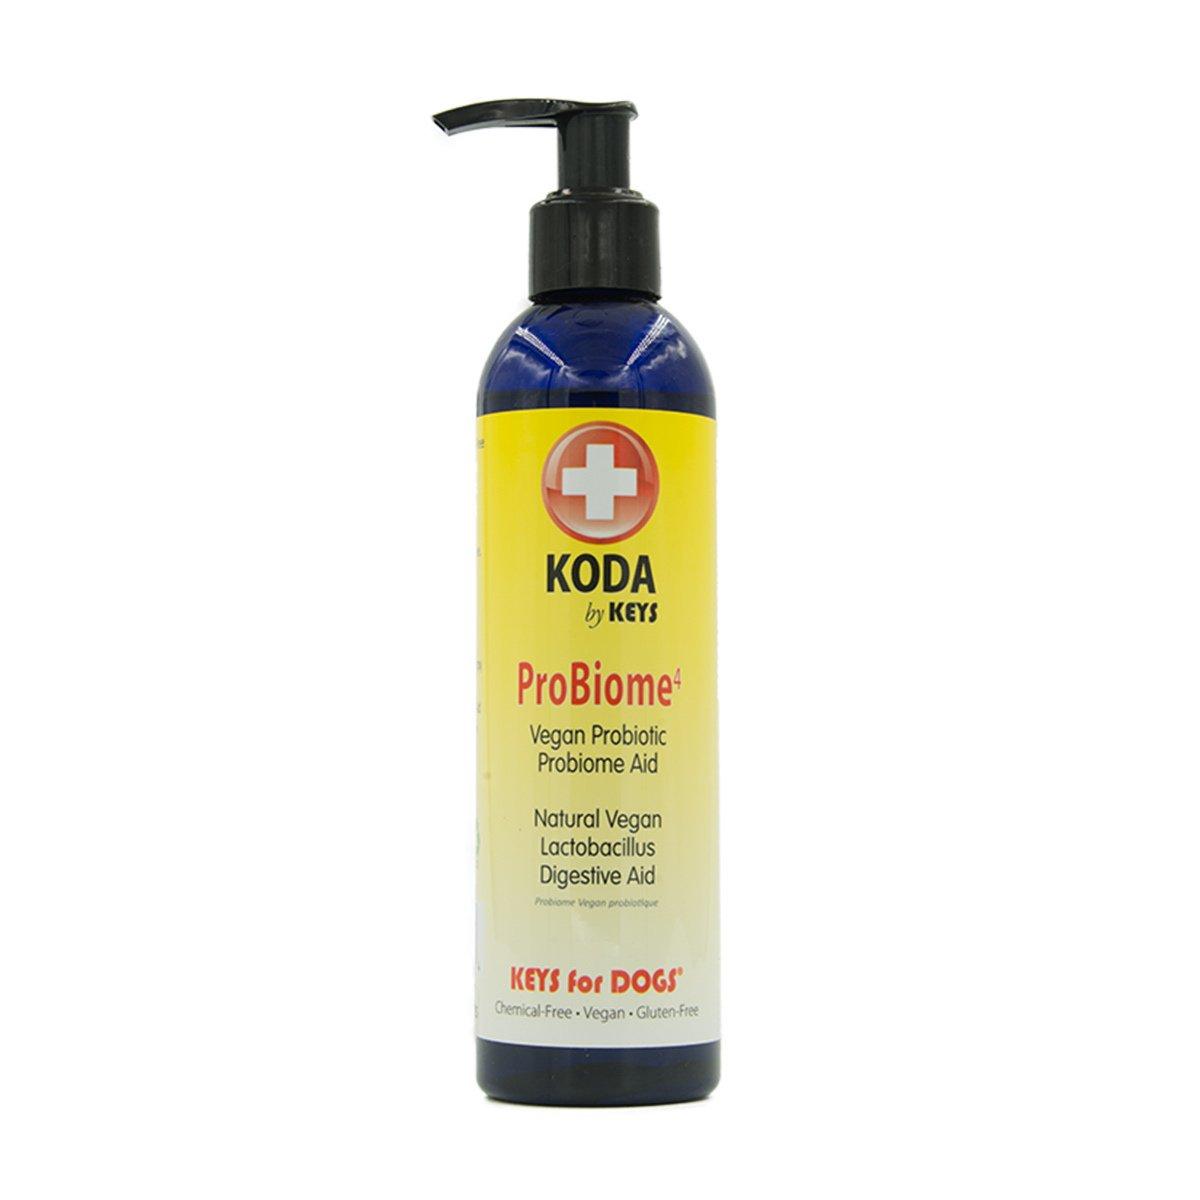 KODA Pro Biome4Lactobacillus Probiotic Dog Supplement